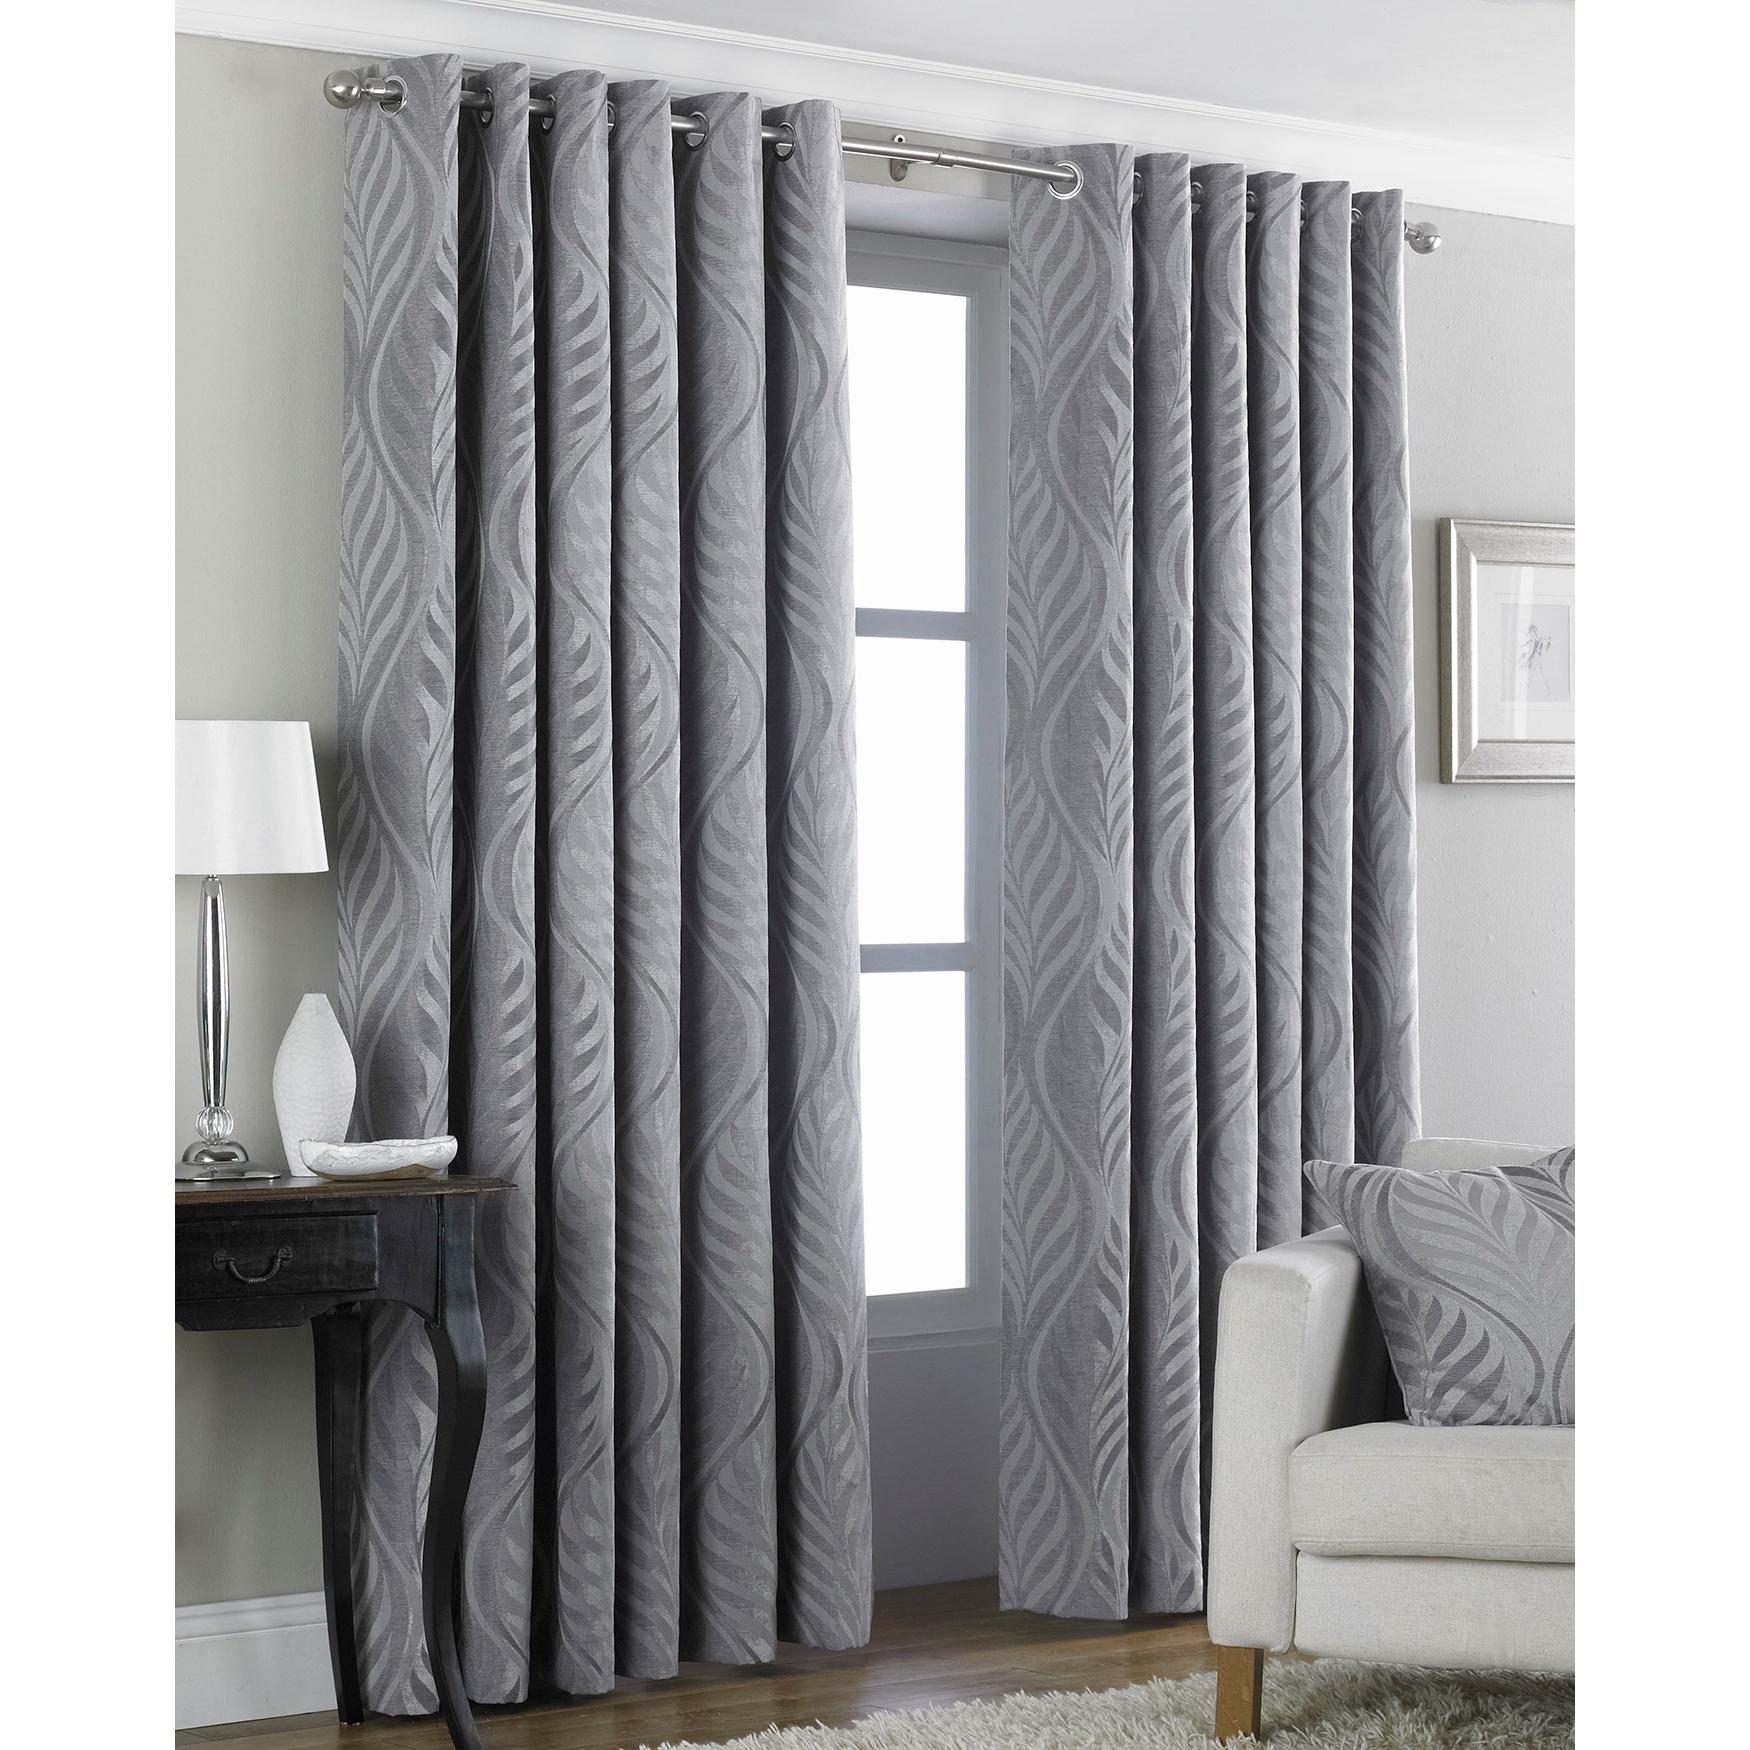 Riva home cortinas de anillas modelo heligan ebay - Anillas de cortinas ...